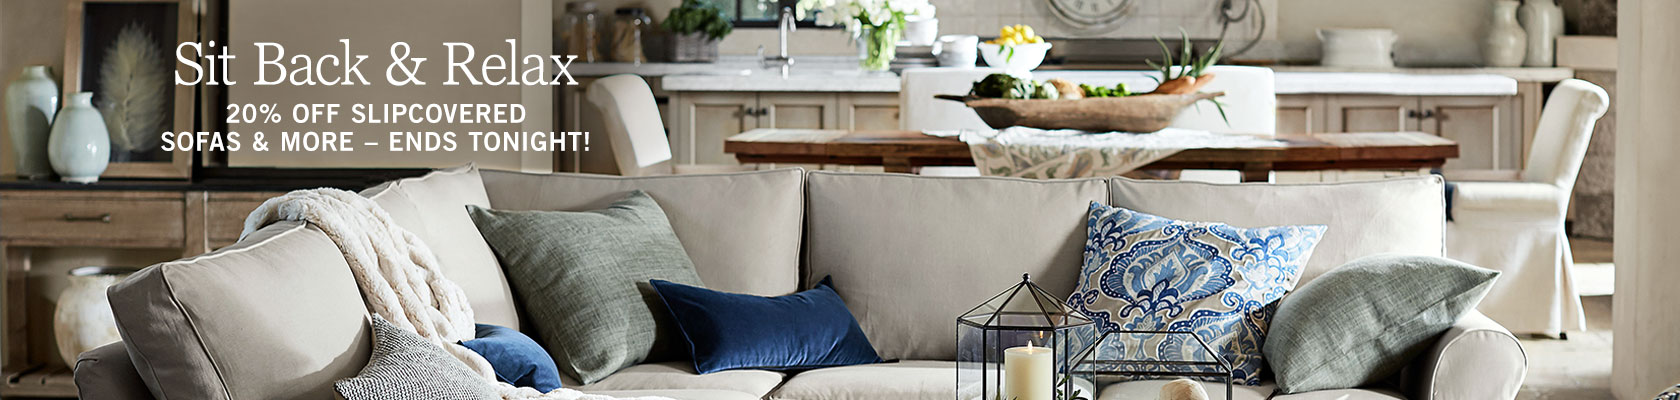 Slipcovered Sofas & More Sale